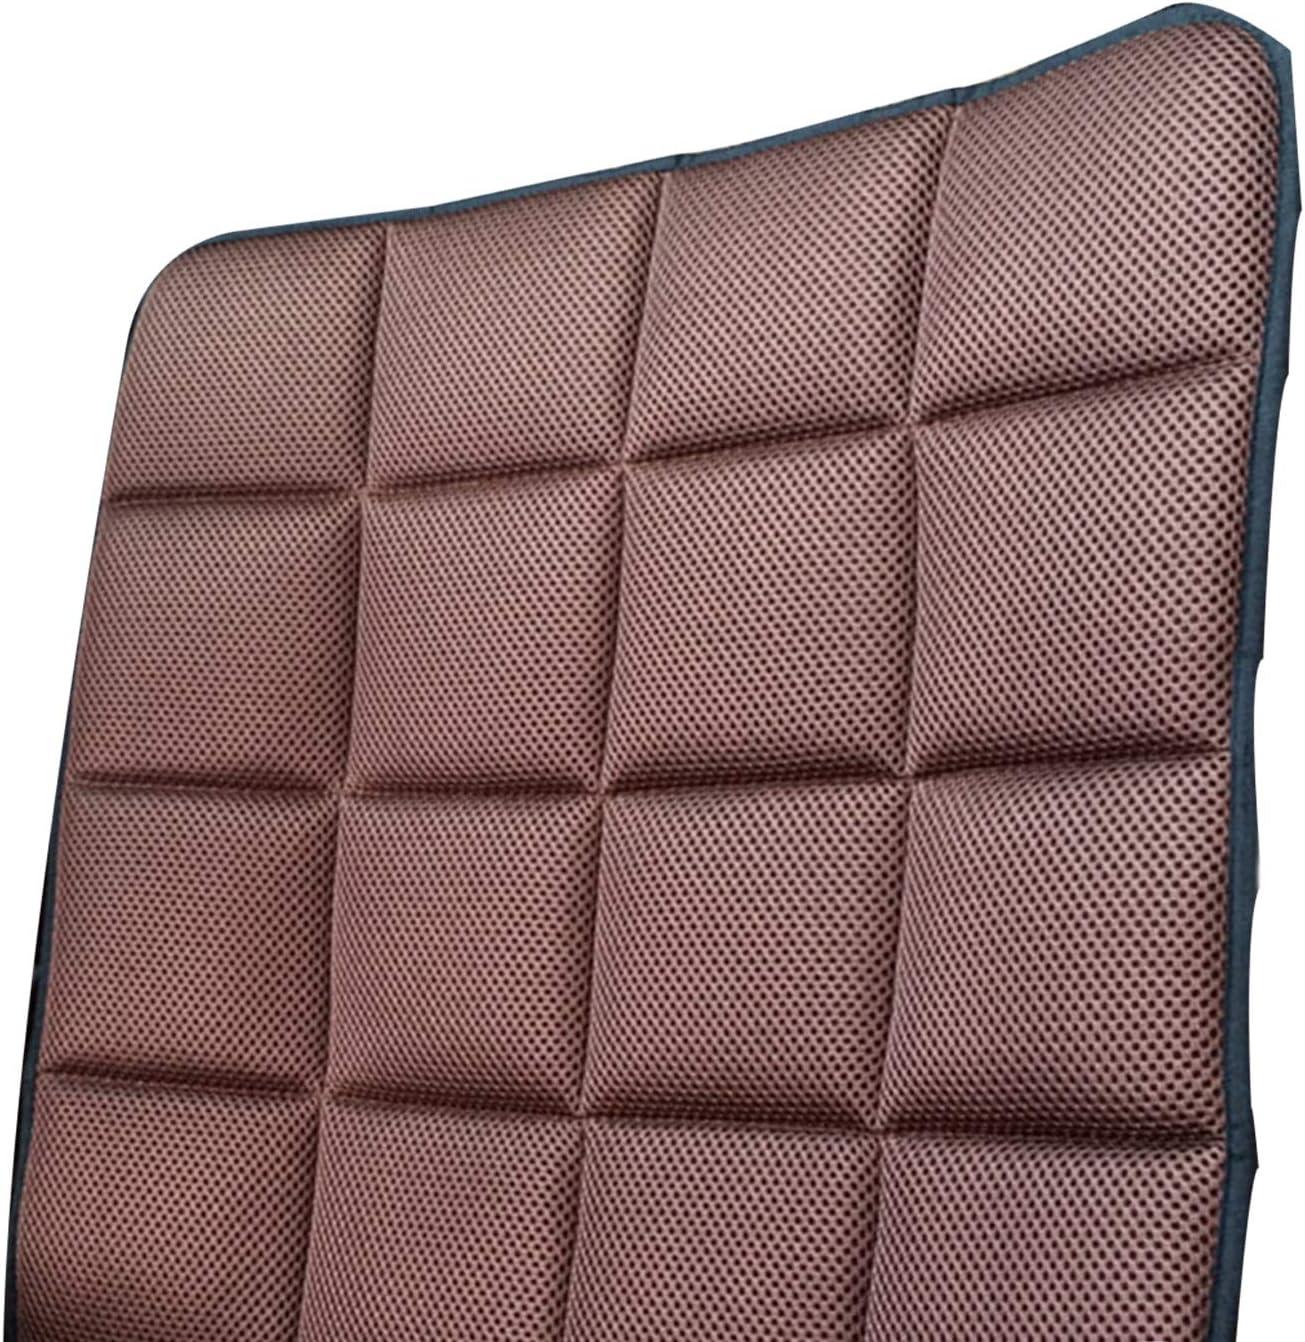 Car Max 81% OFF Seat Cushion Covers Anti-Slip Dedication Soft Square